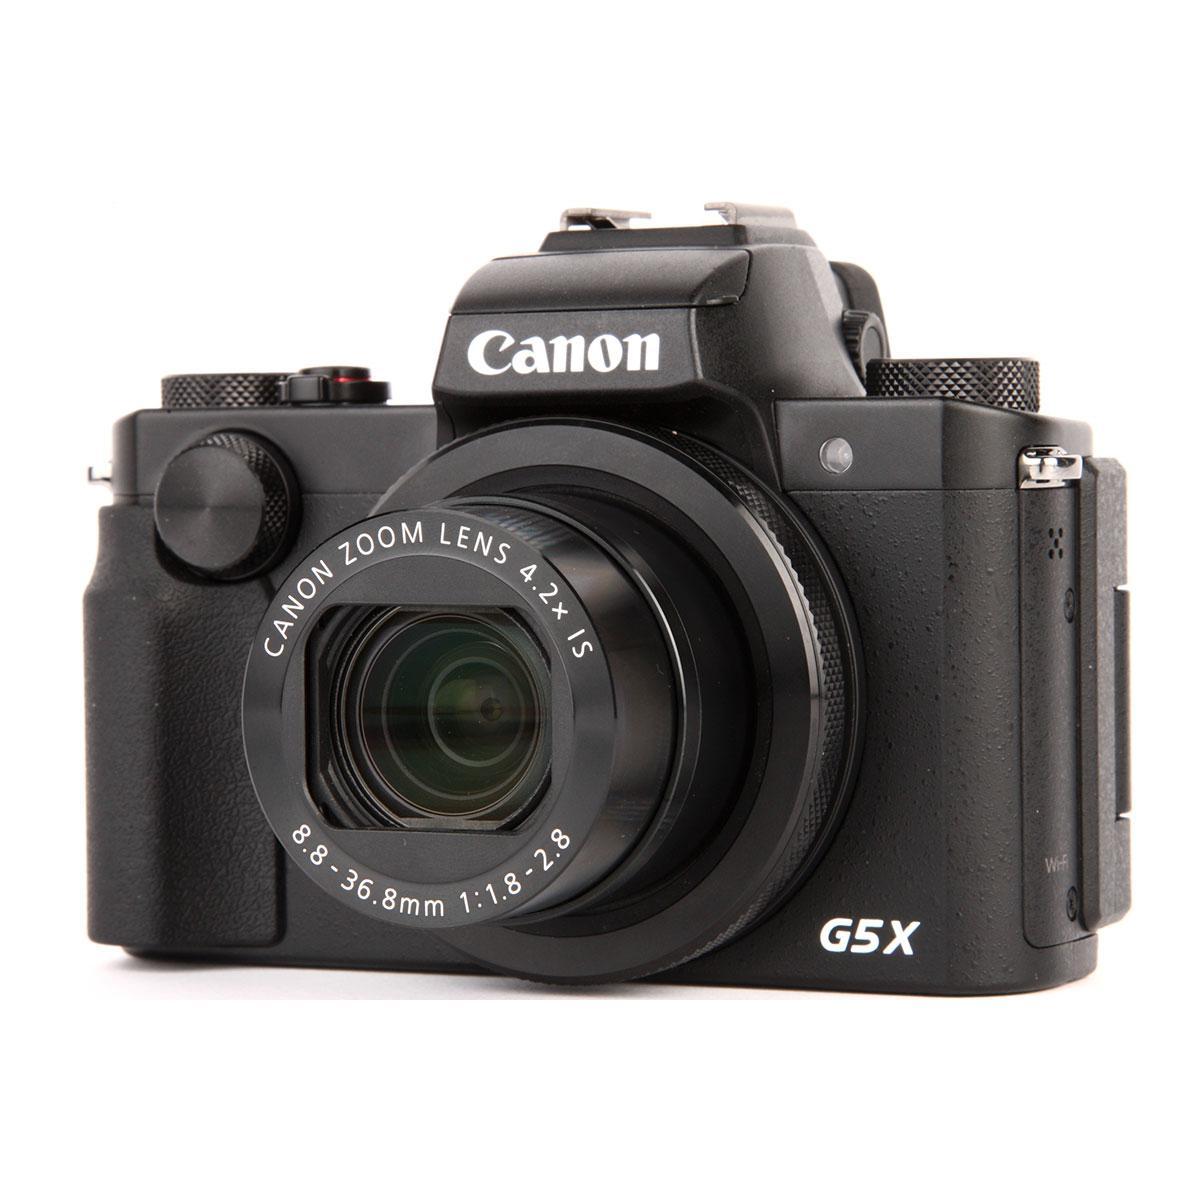 Compact Canon PowerShot G5X - Musta + Objektiivi Canon 24-100mm f/1.8-2.8